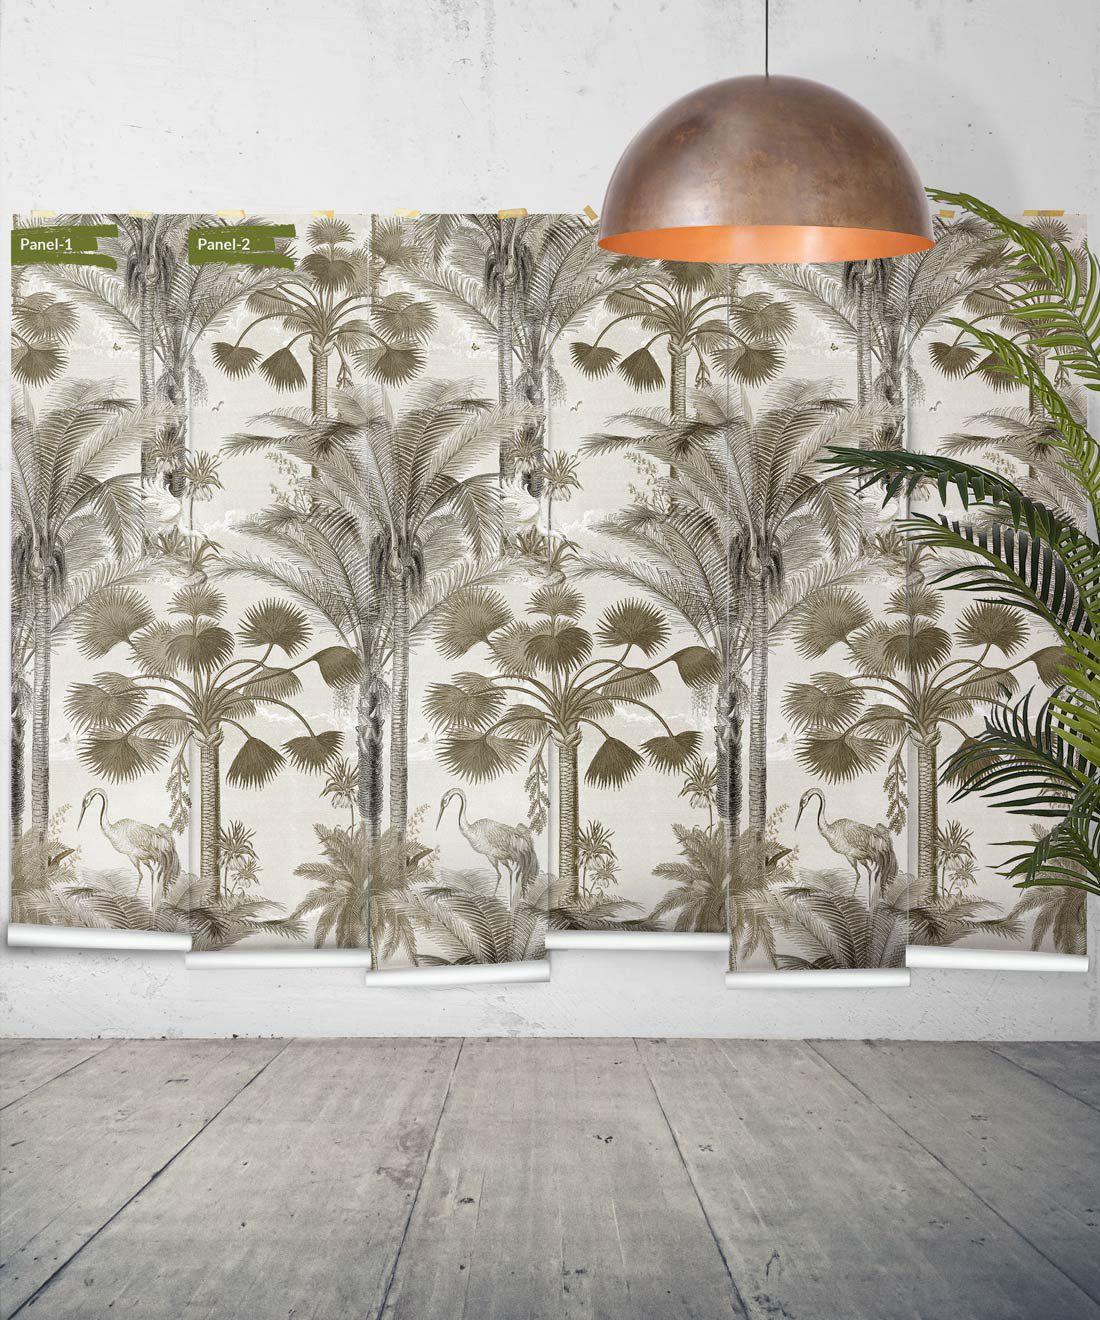 Kerala Palms Wallpaper Mural •Bethany Linz • Palm Tree Mural • Sepia • Panels